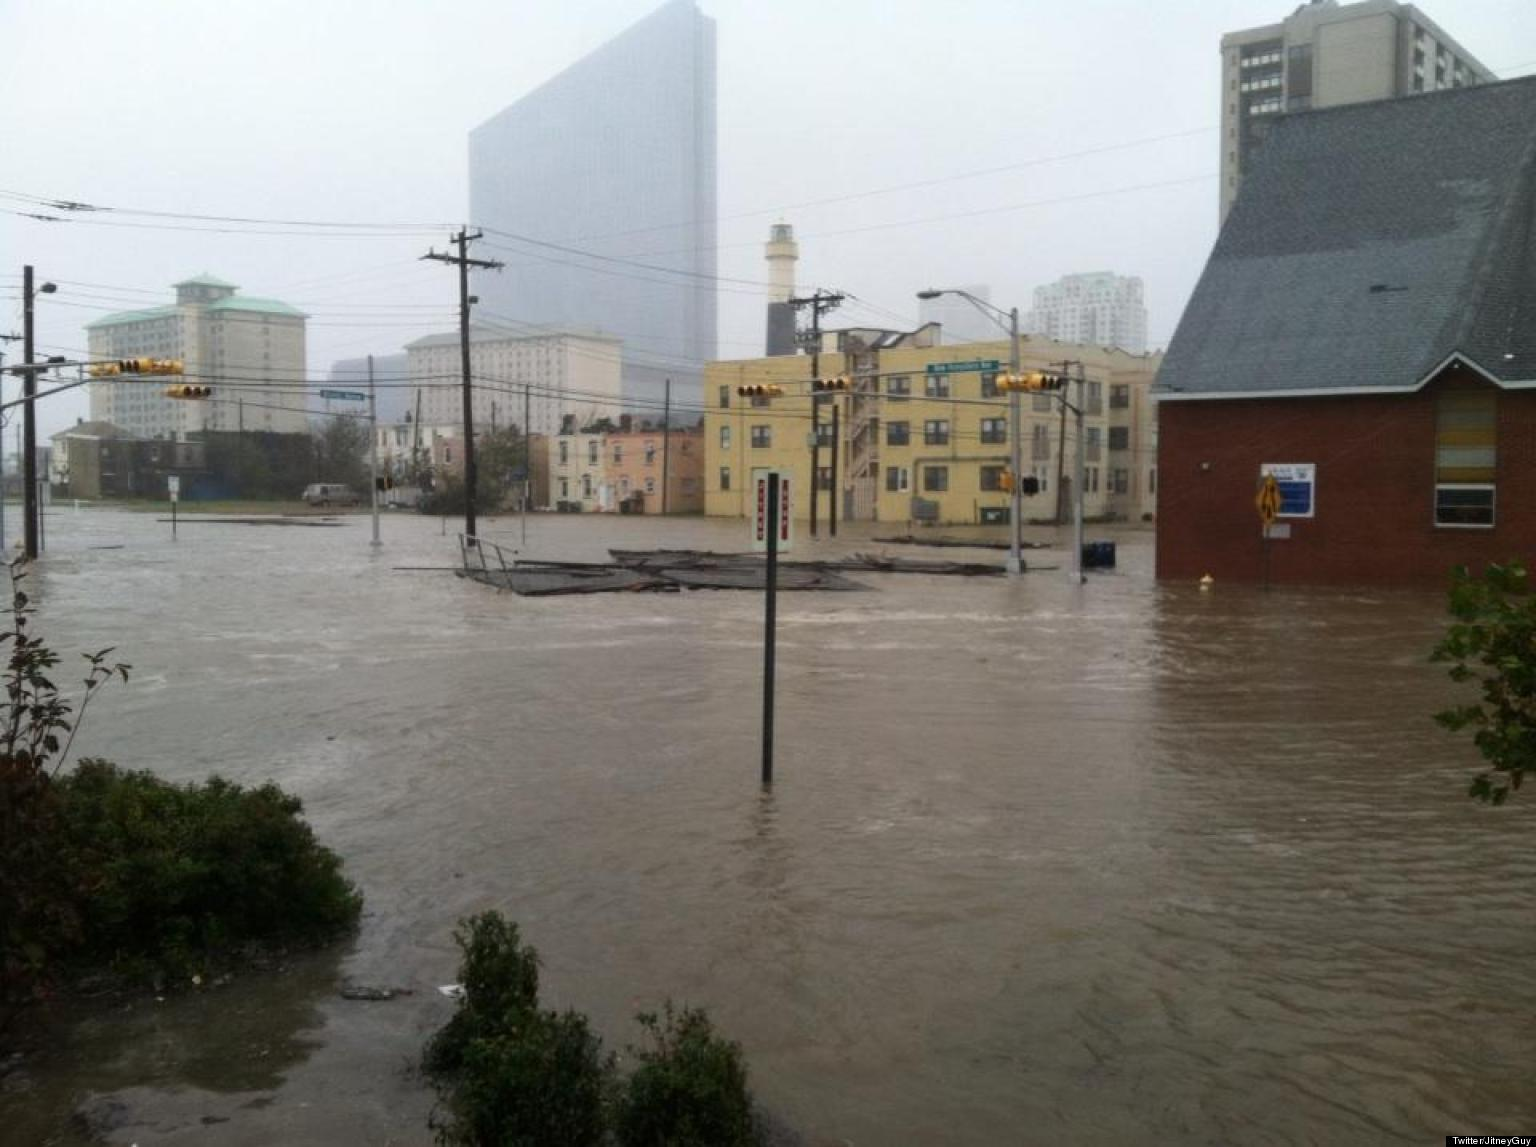 Atlantic City Flooding Photos Reveal Hurricane Sandy Damage